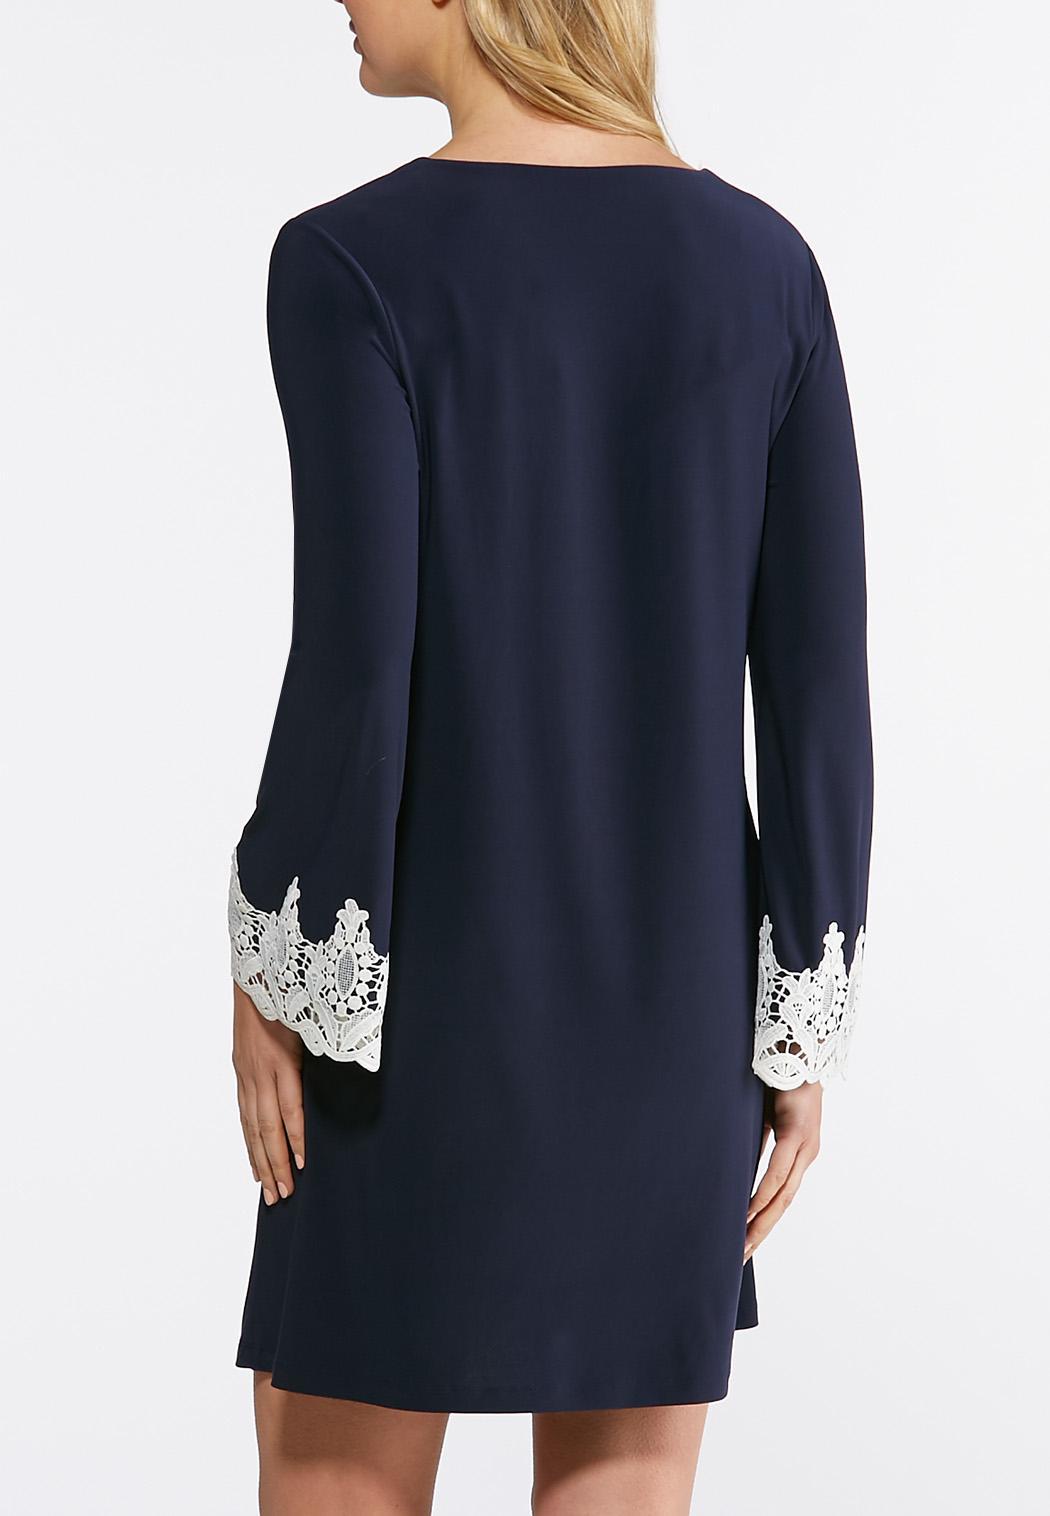 Plus Size Crochet Trim Swing Dress A-line & Swing Cato Fashions